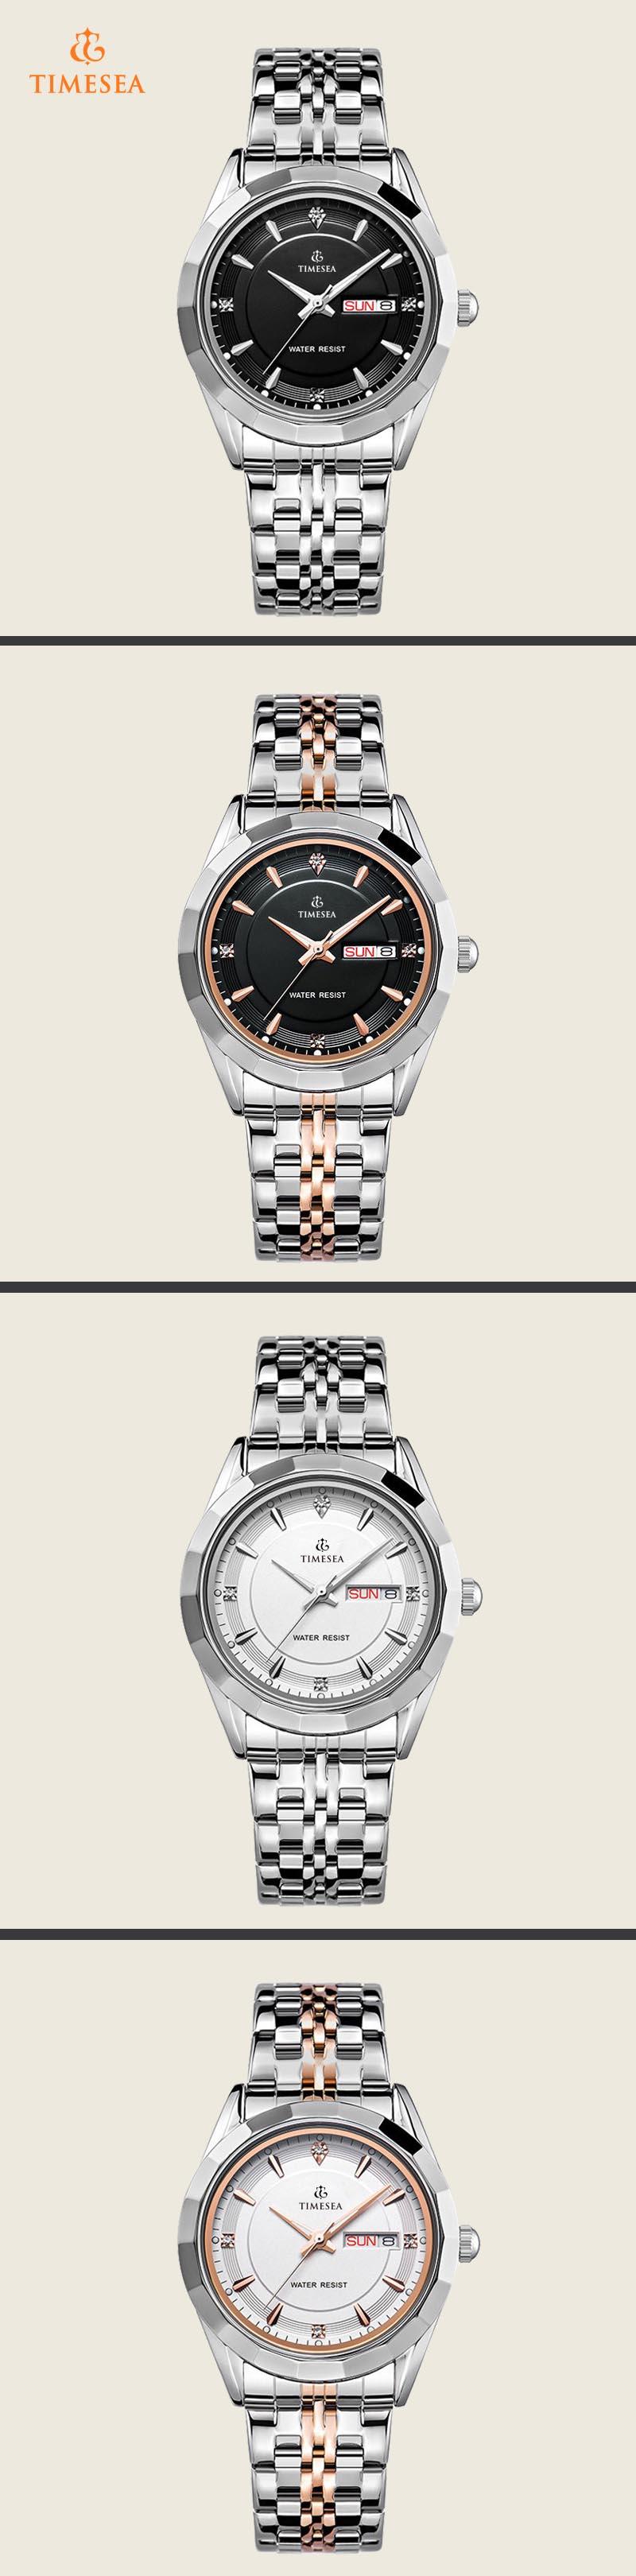 Mens Steel Display Analog Quartz Watch Wrist Gift Watch72370